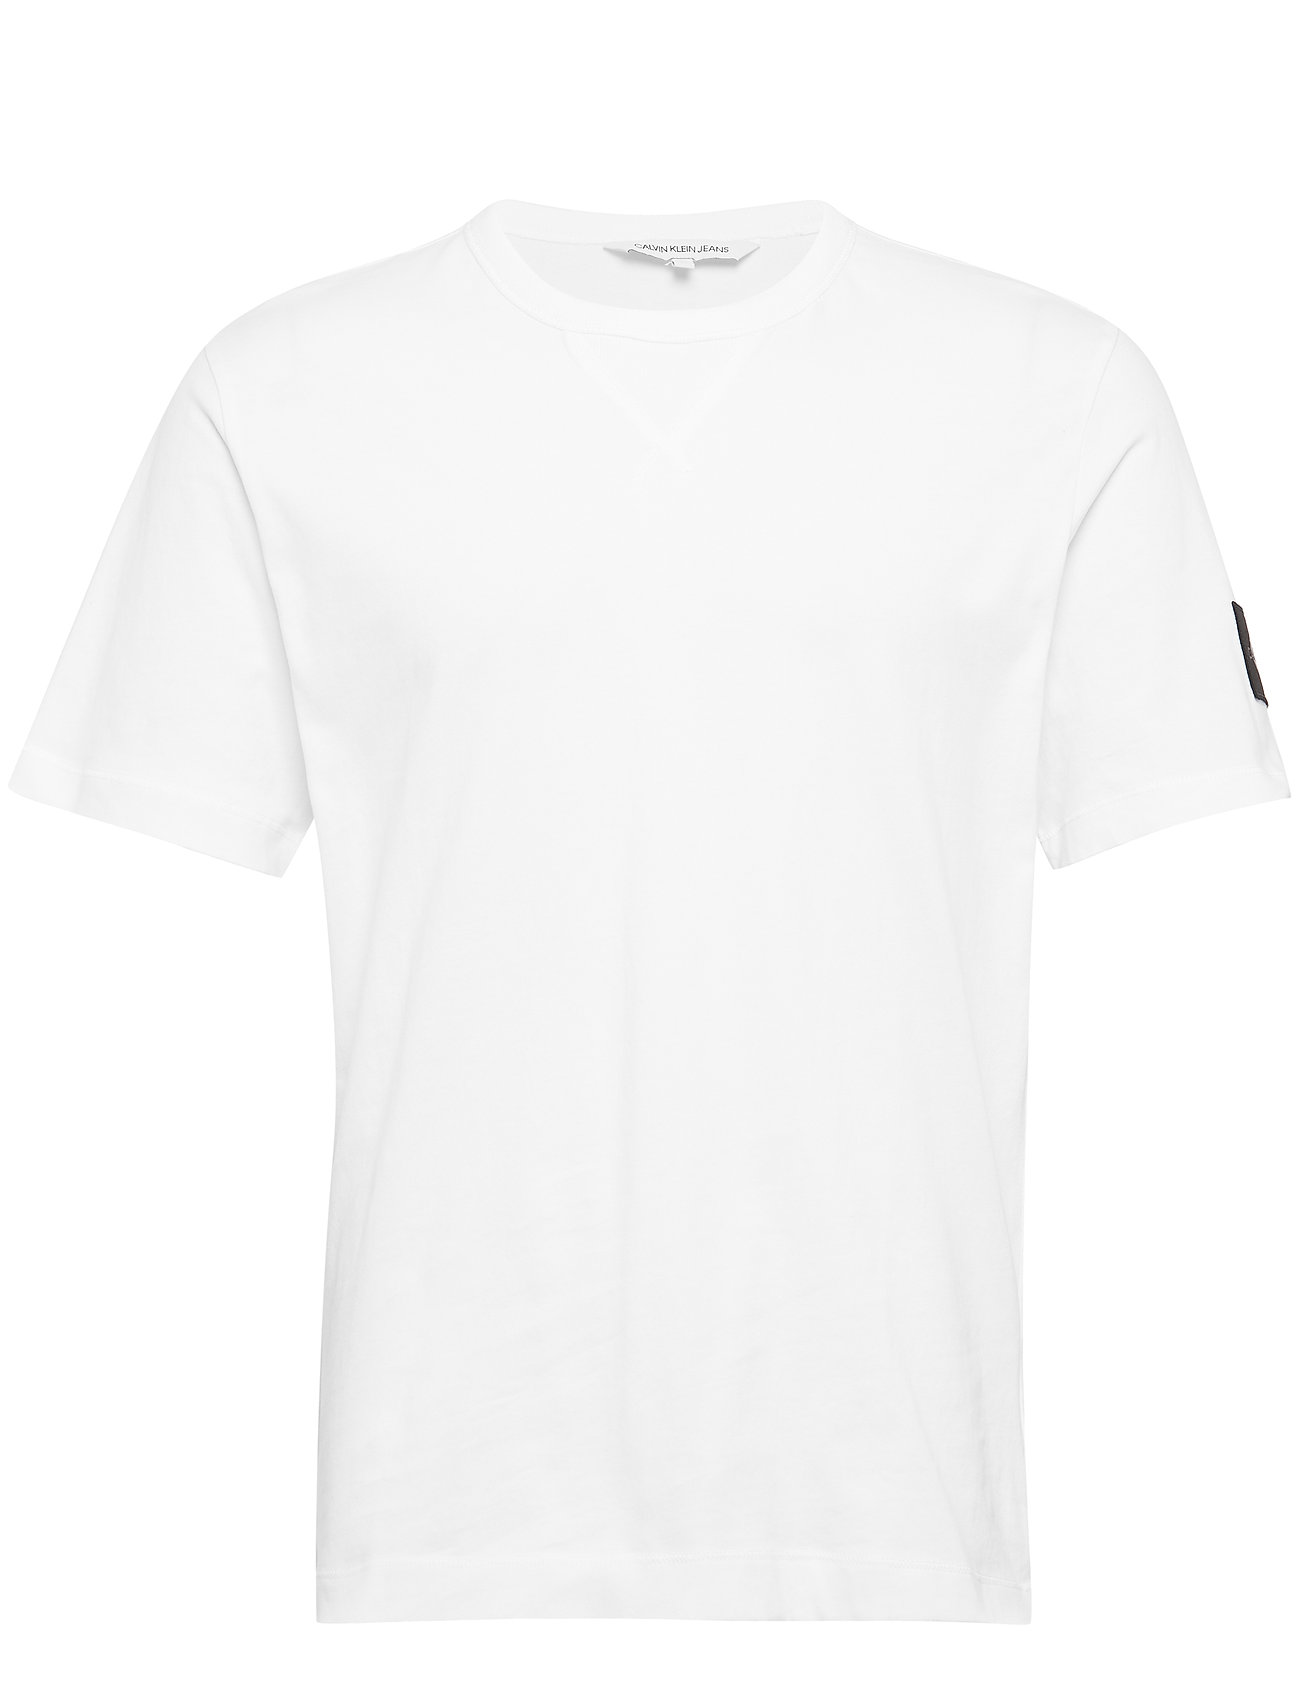 Calvin Klein Jeans MONOGRAM SLEEVE BADG - BRIGHT WHITE